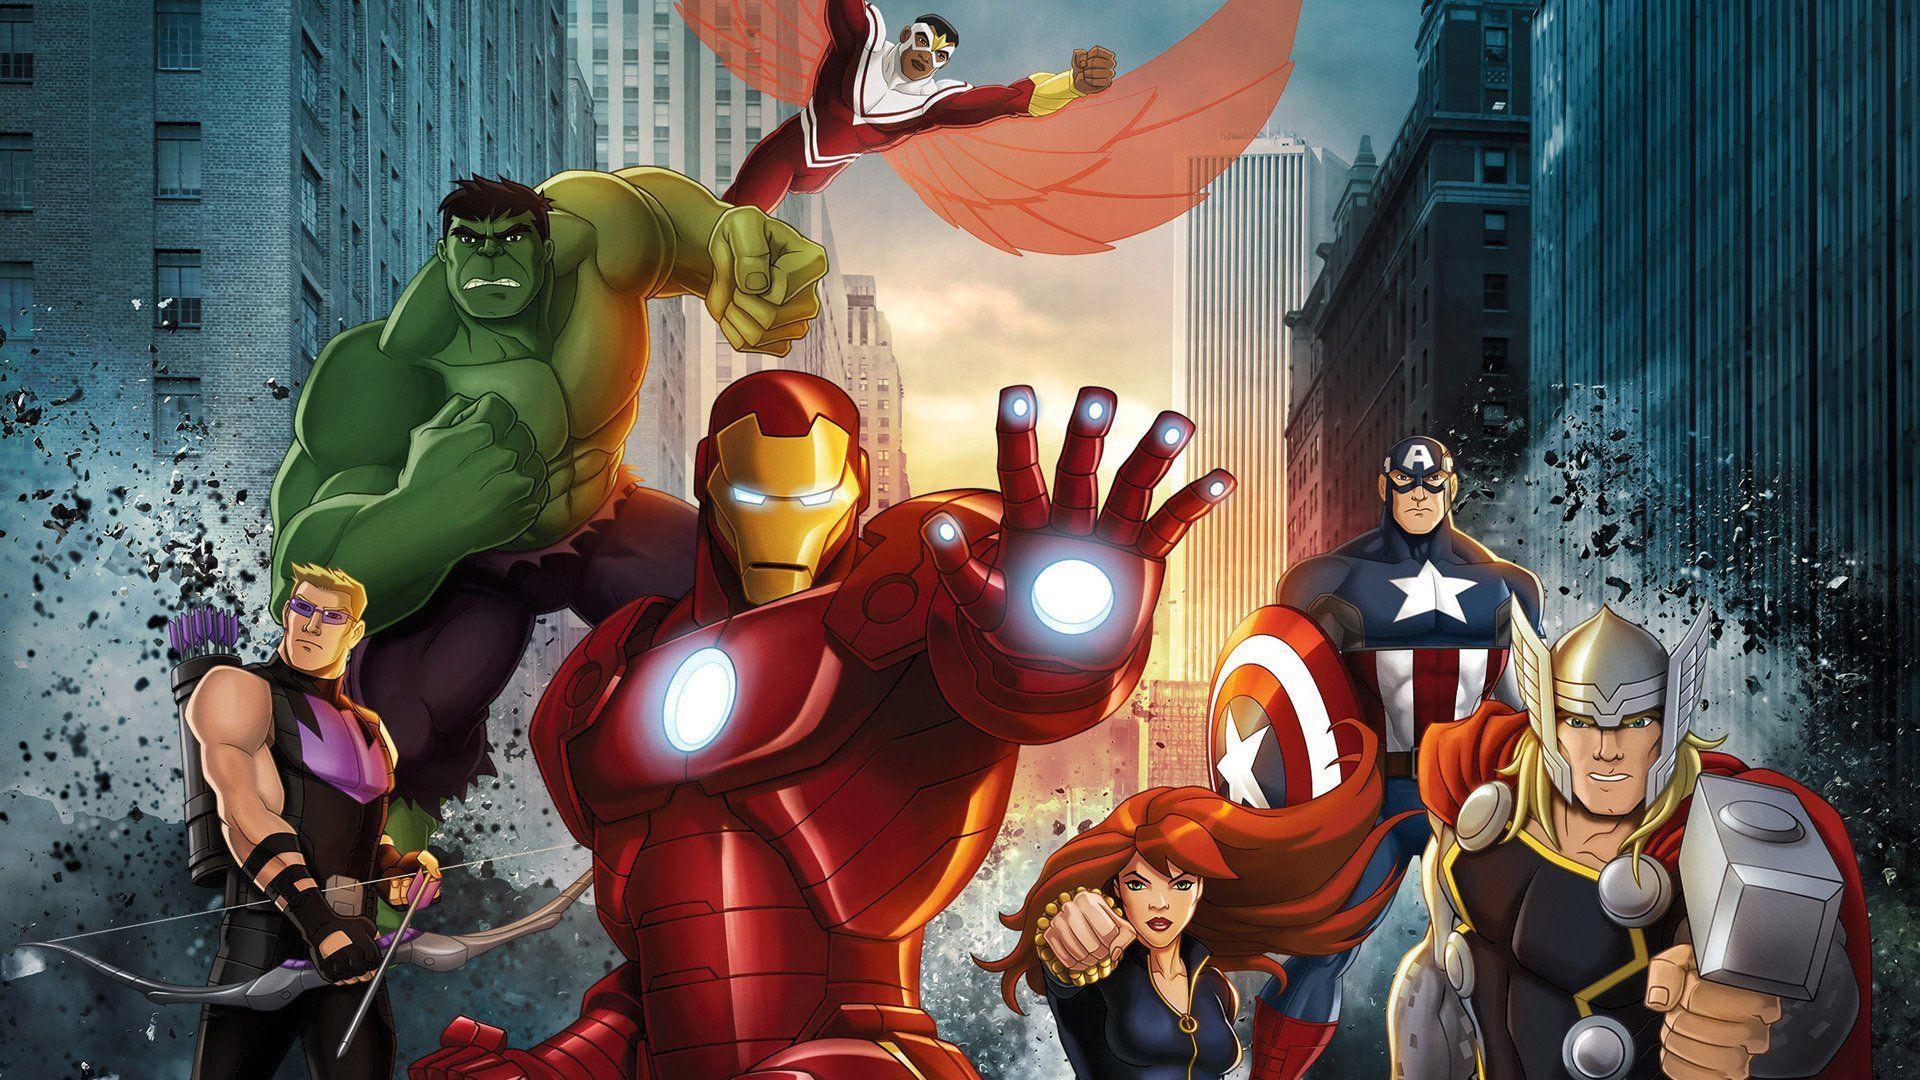 Avengers Assemble Wallpapers Top Free Avengers Assemble Backgrounds Wallpaperaccess